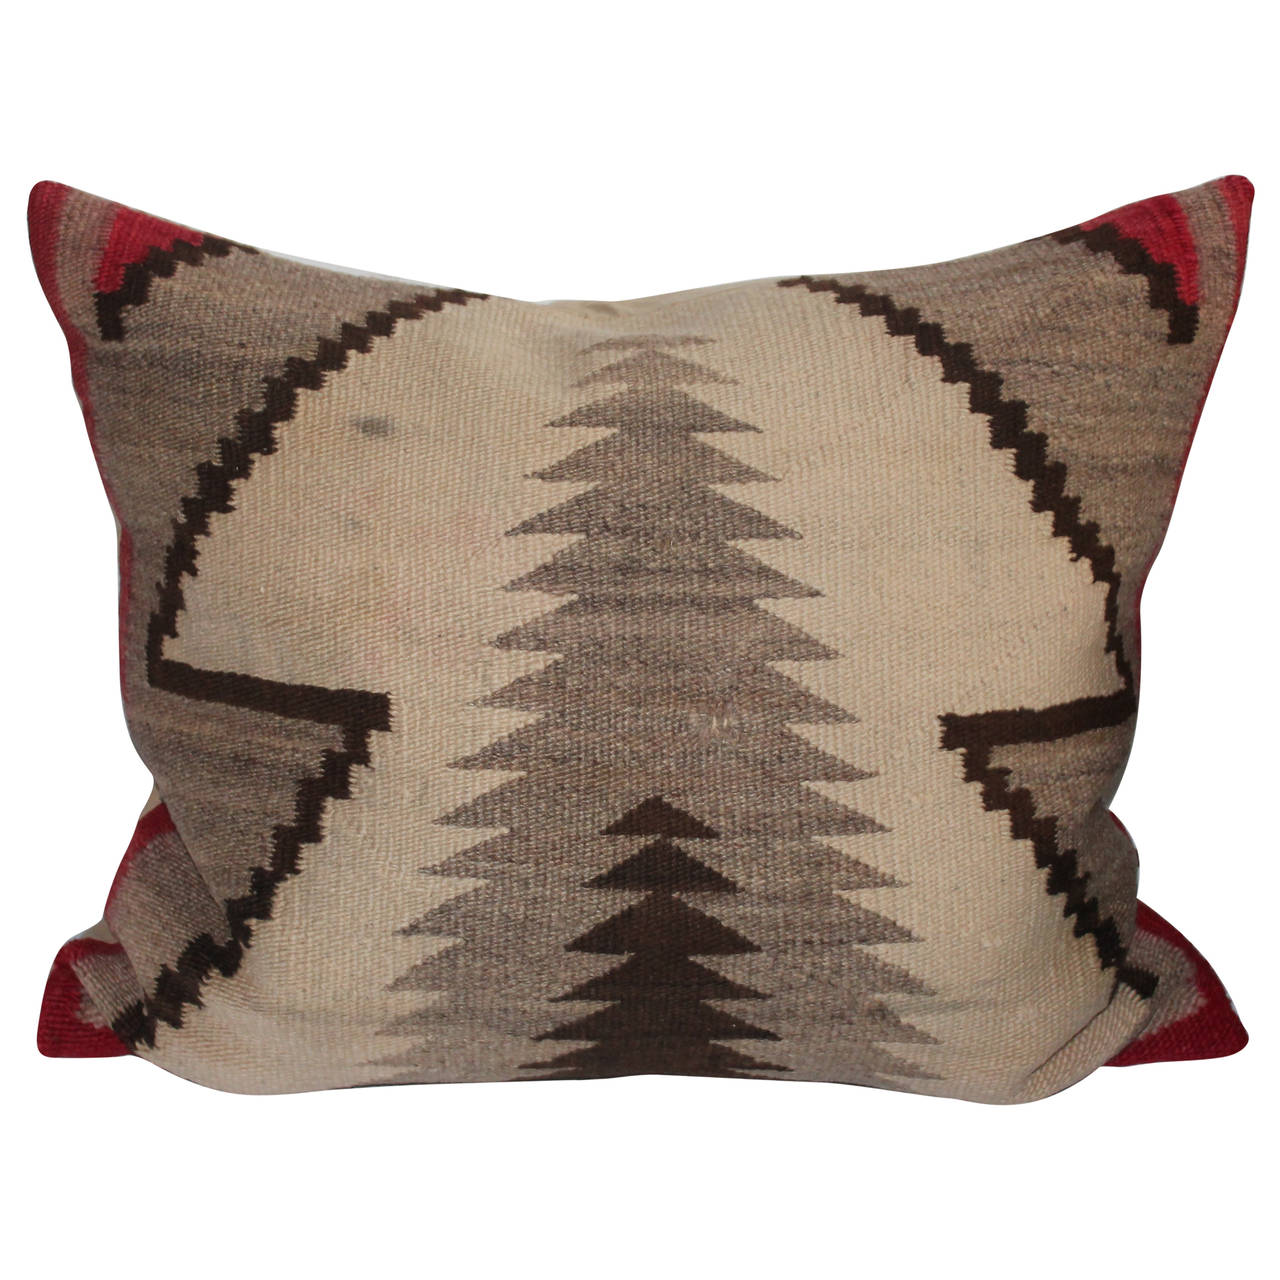 Monumental Navajo Indian Weaving Pillow